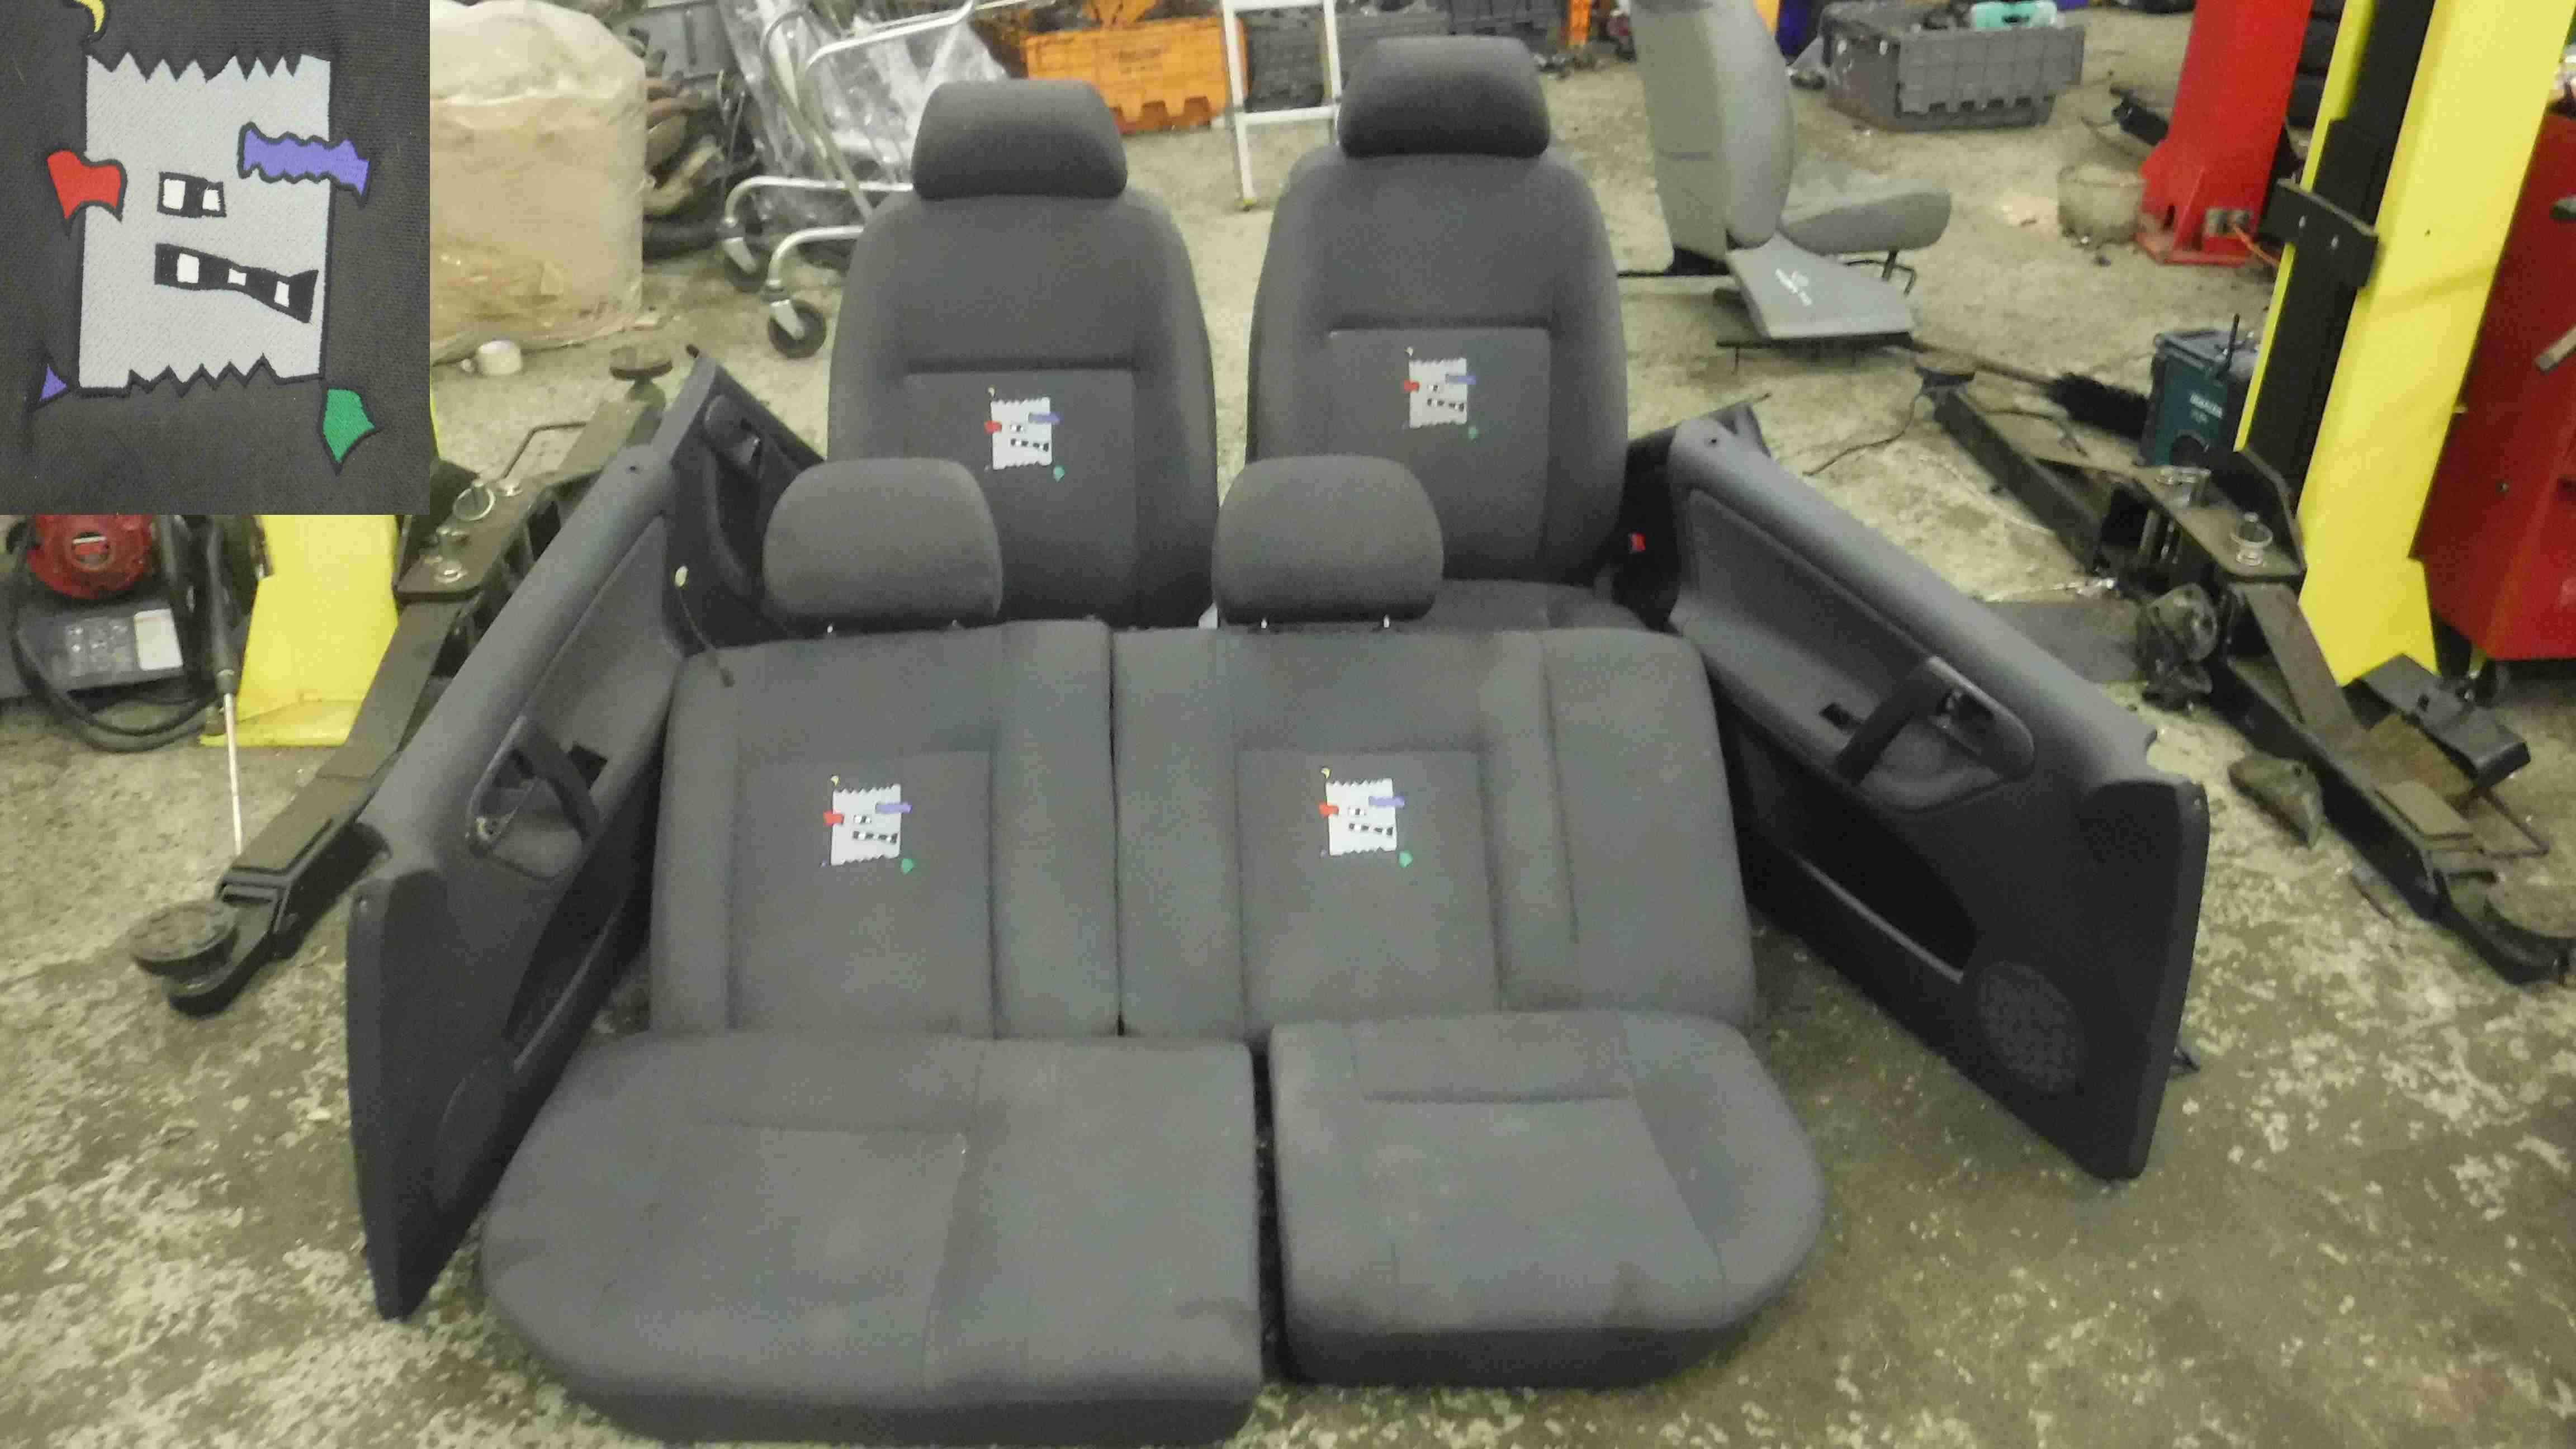 Volkswagen Jetta Parts >> Volkswagen Polo 6N2 1999-2003 Full Interior Seat Chairs